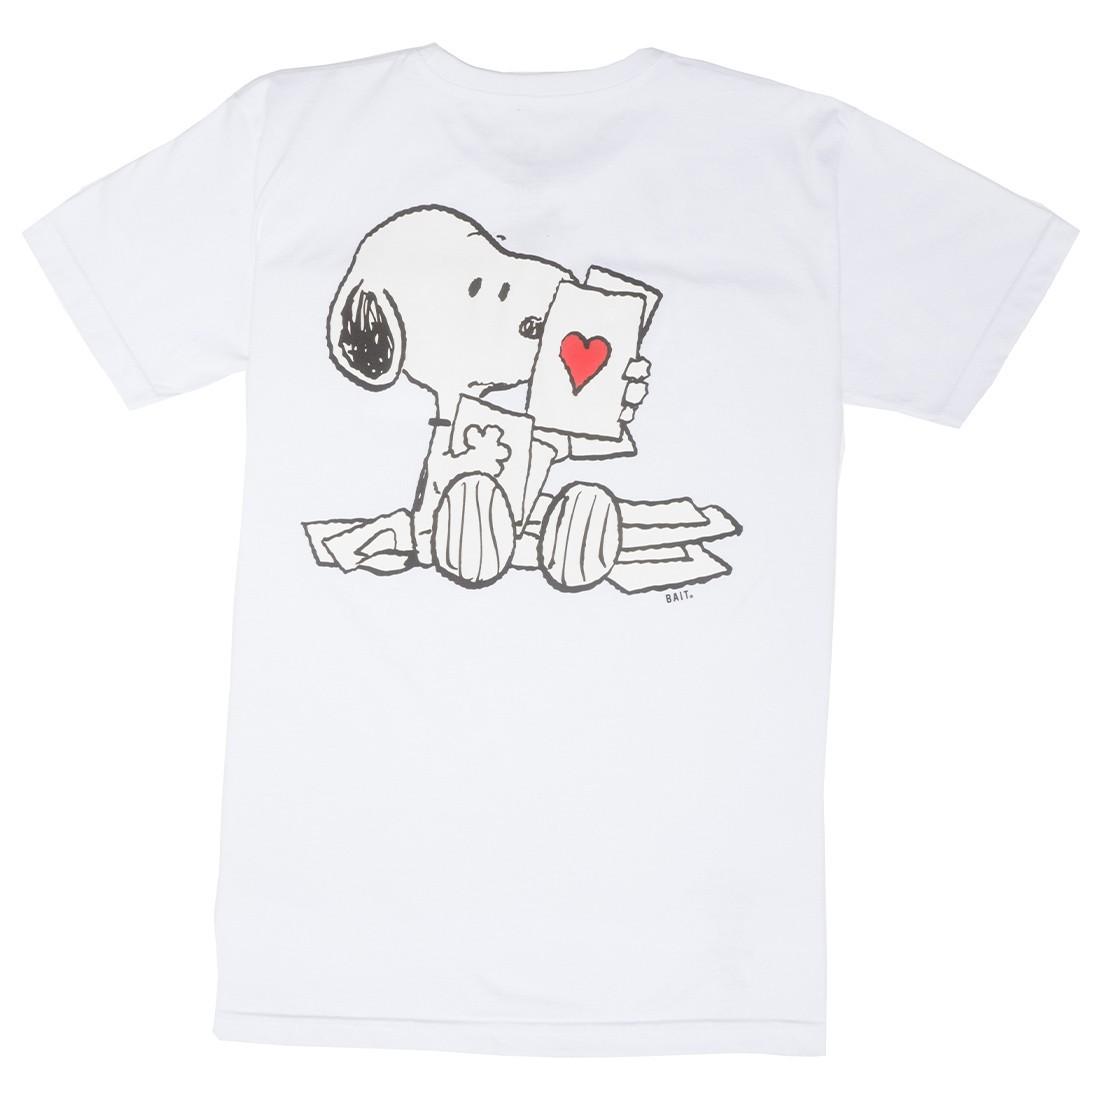 BAIT x Snoopy Men Lots Of Love Tee (white)